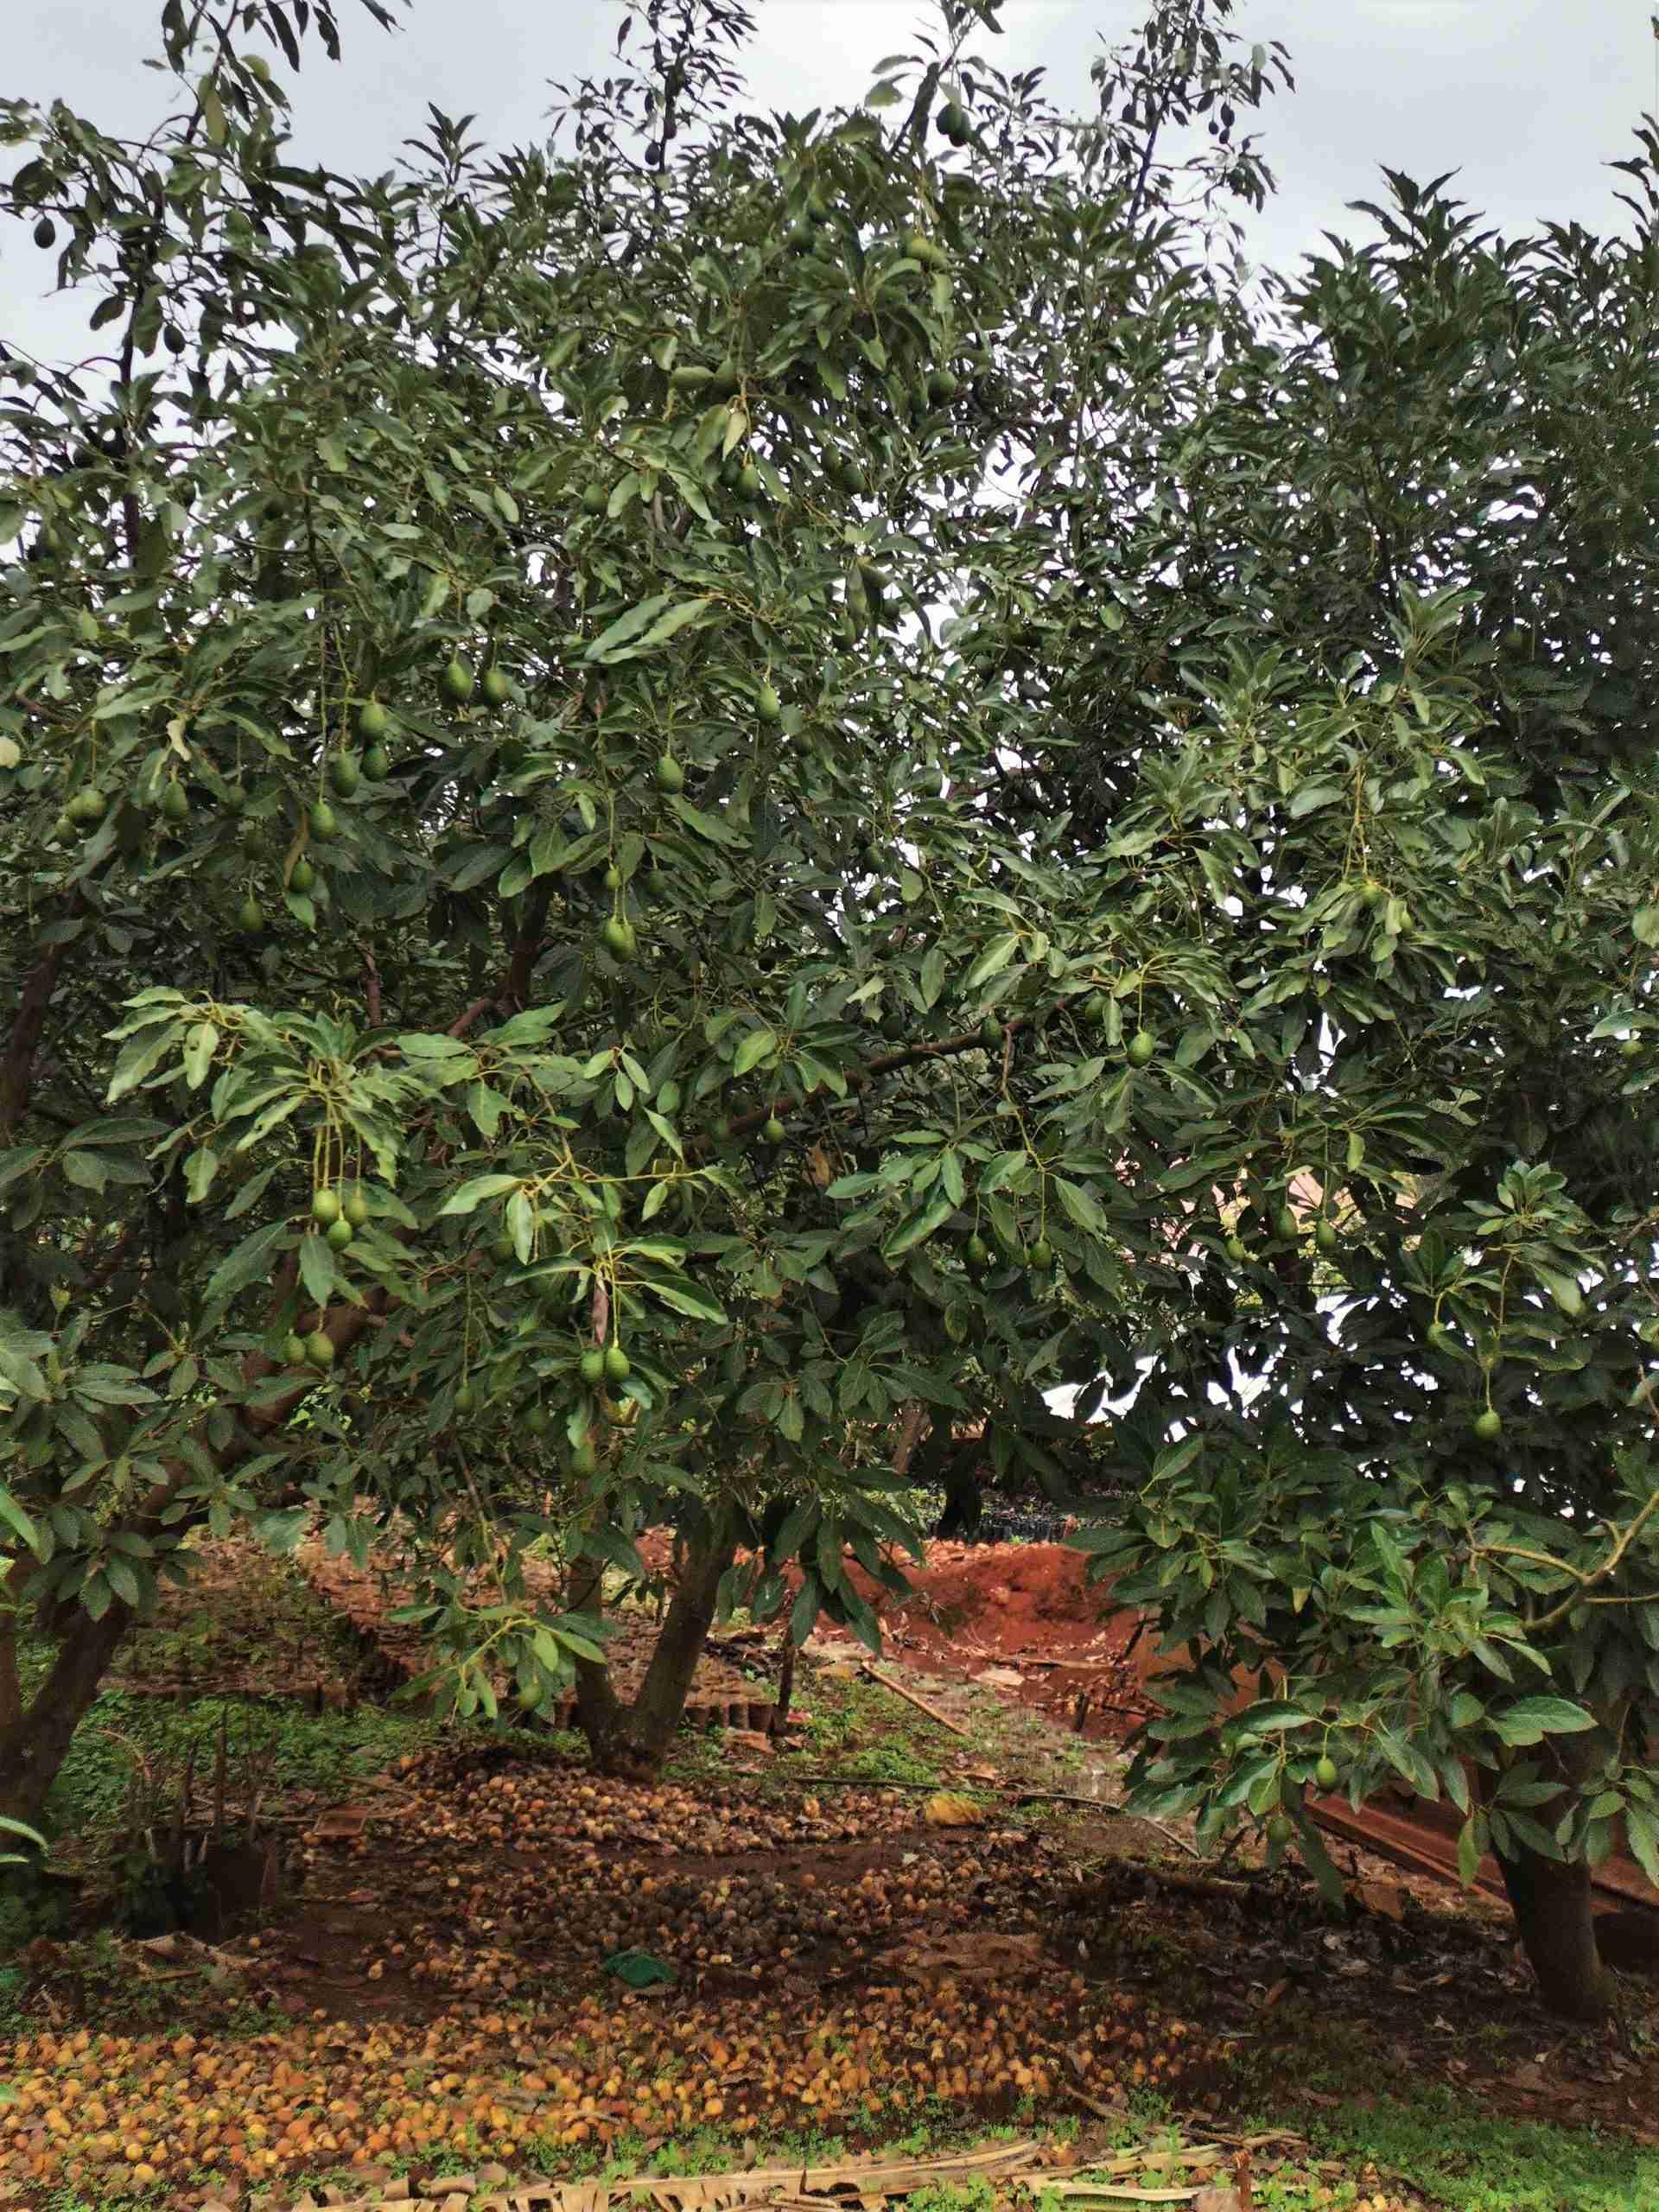 Three Hass Avocado Trees in Samuel Tirimba's compound